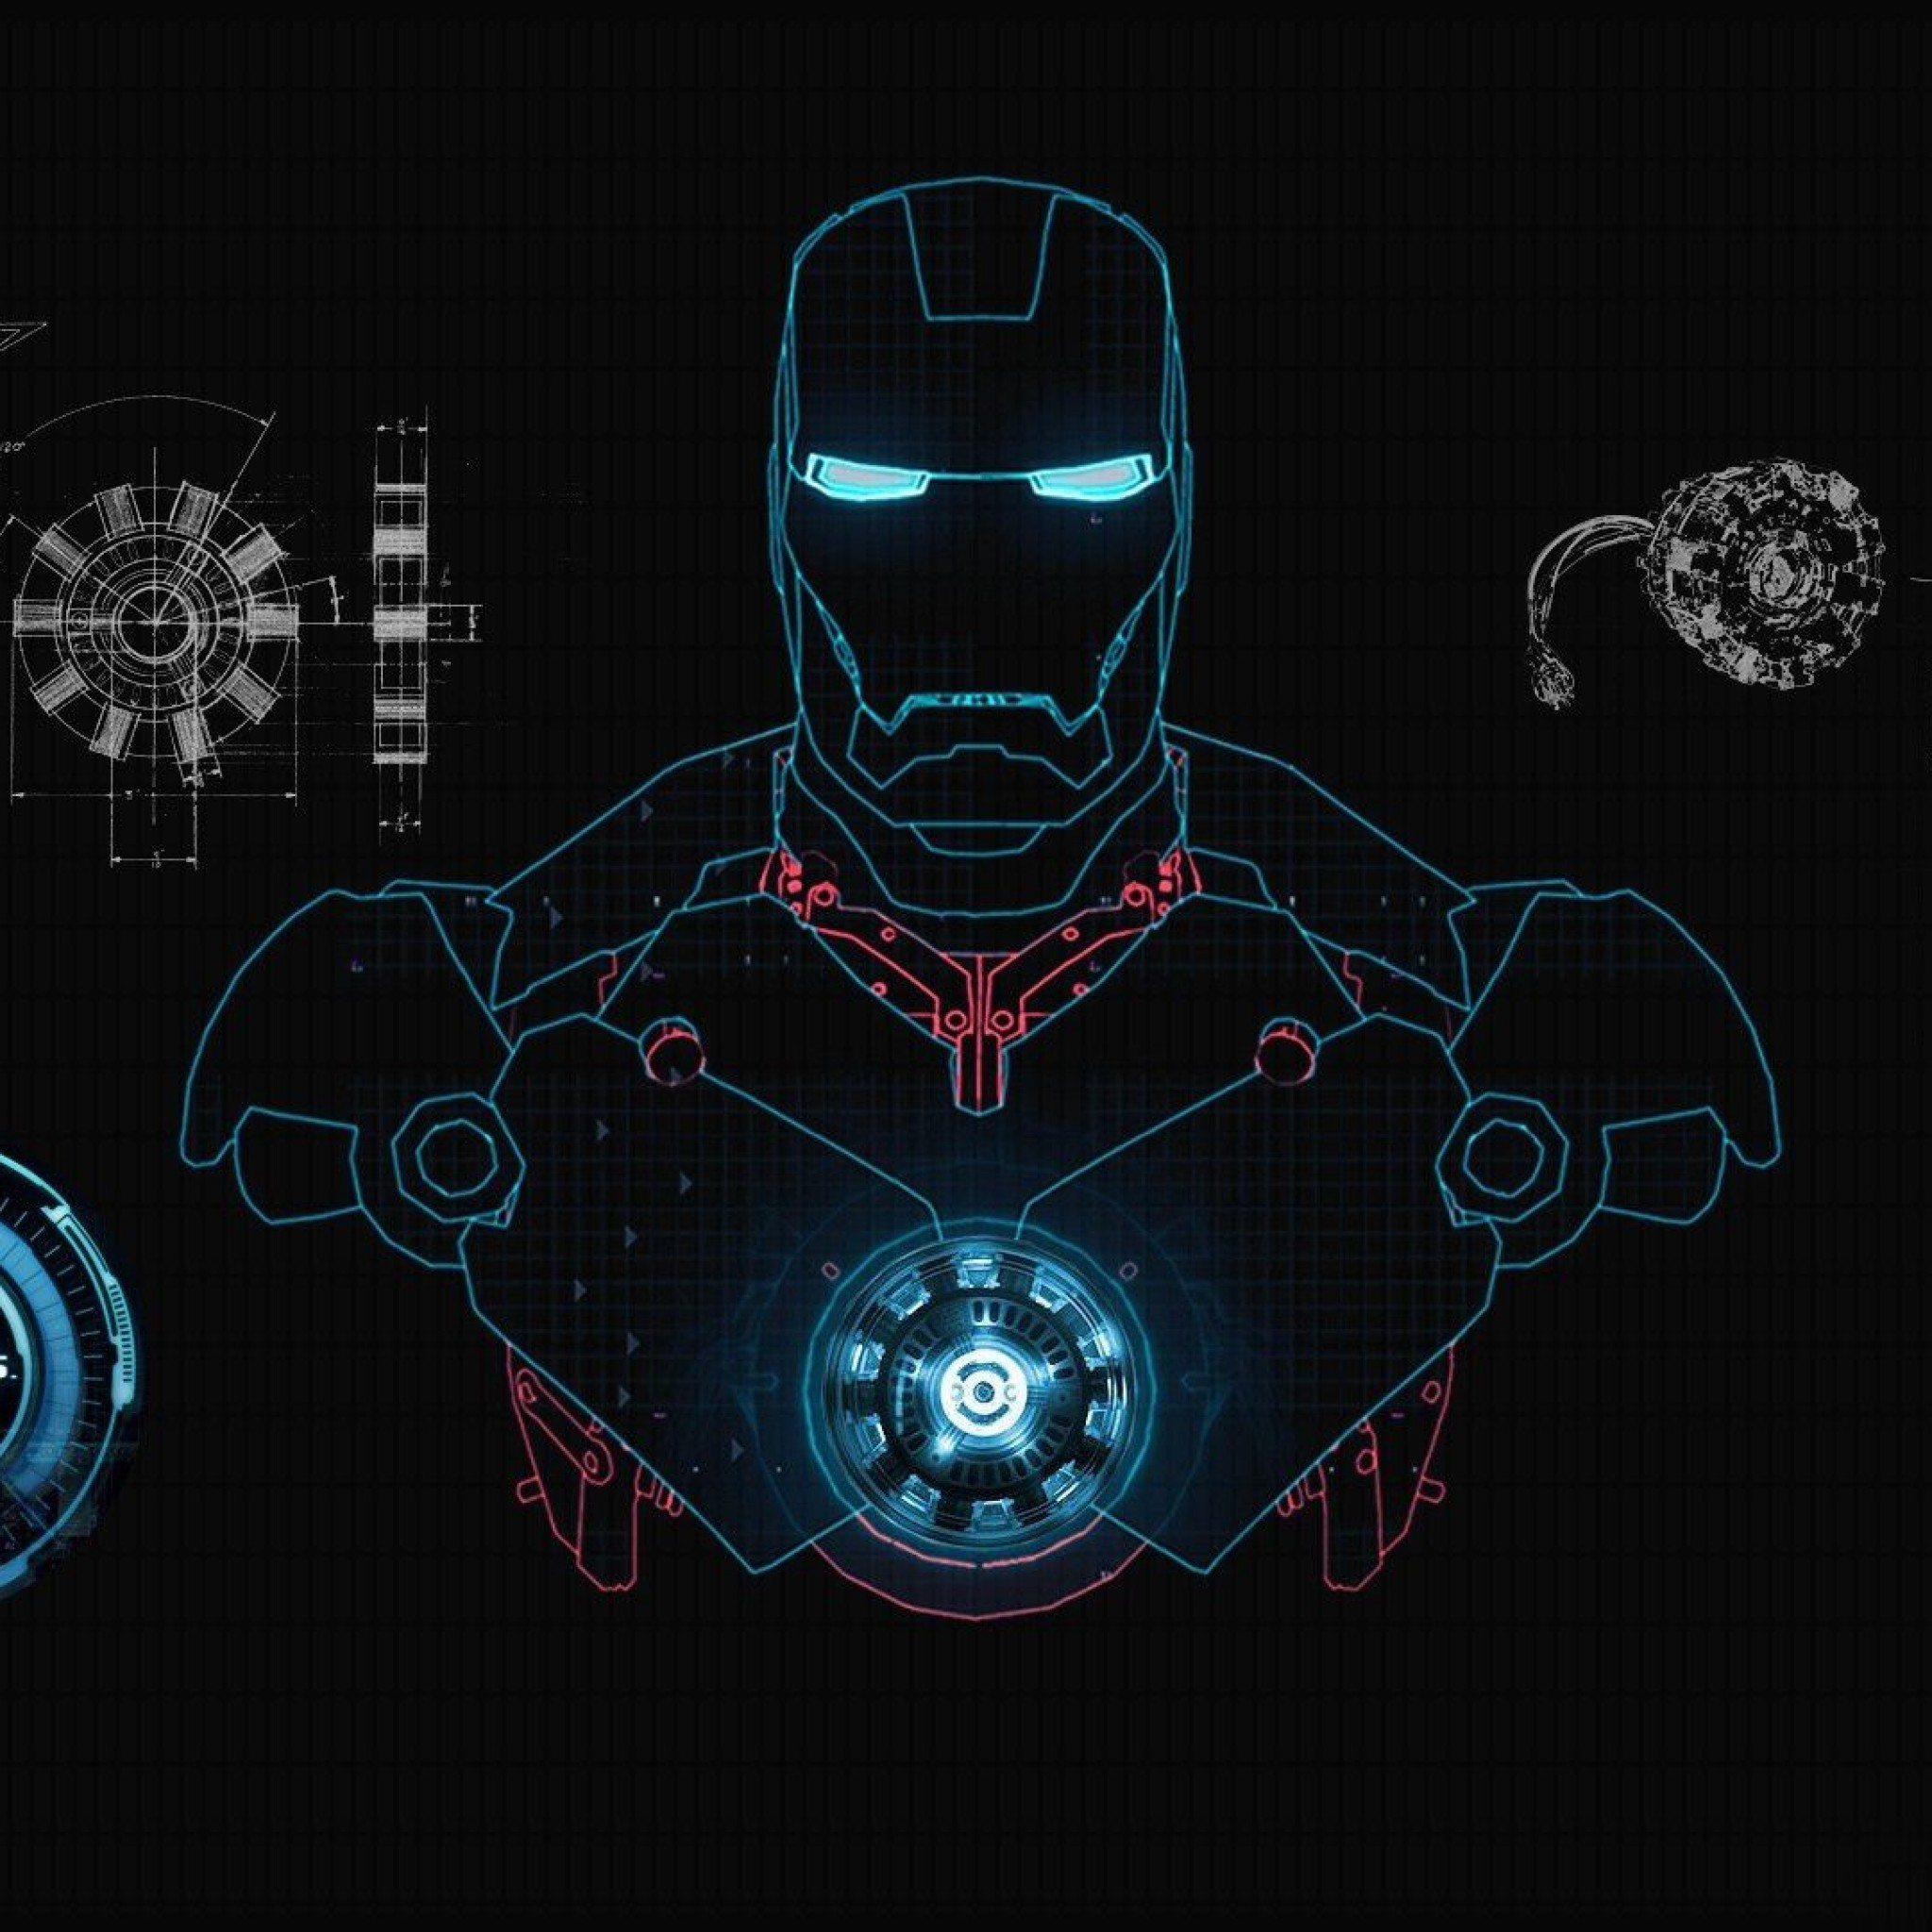 Iron Man Wallpaper Jarvis 53510 at Movies Wallpapers 1080p HD 2048x2048